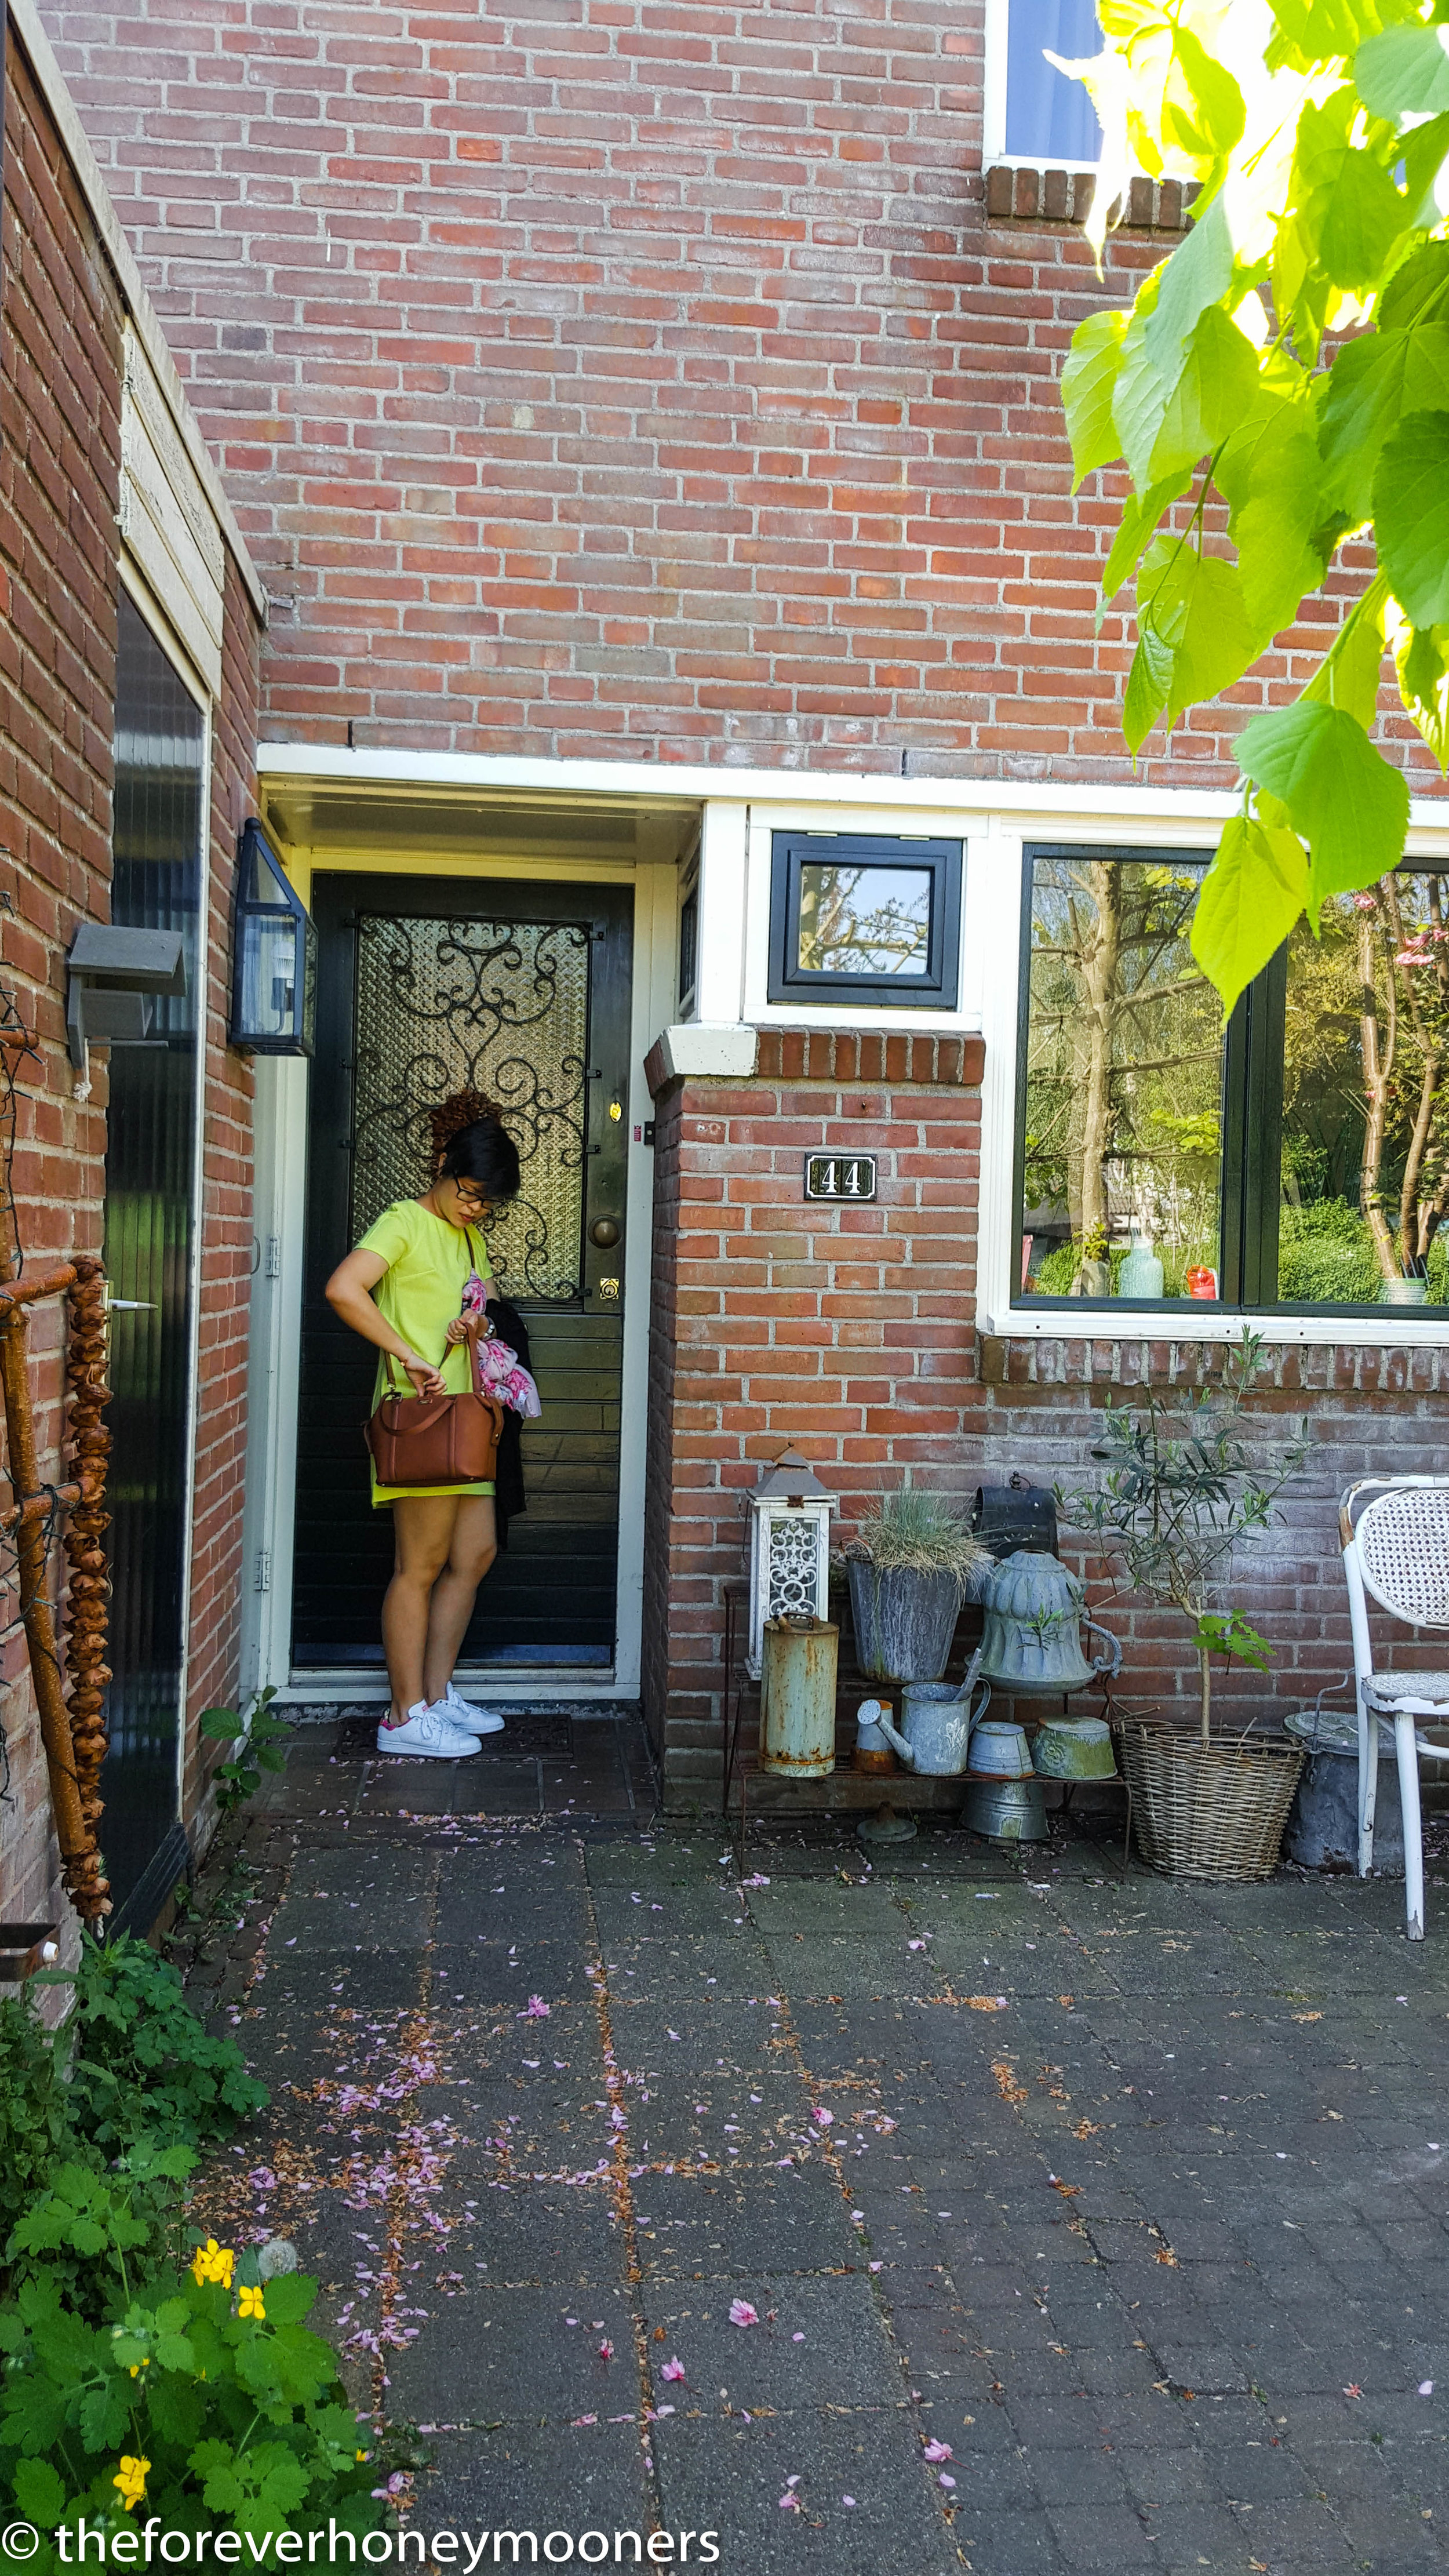 House in Zaandam